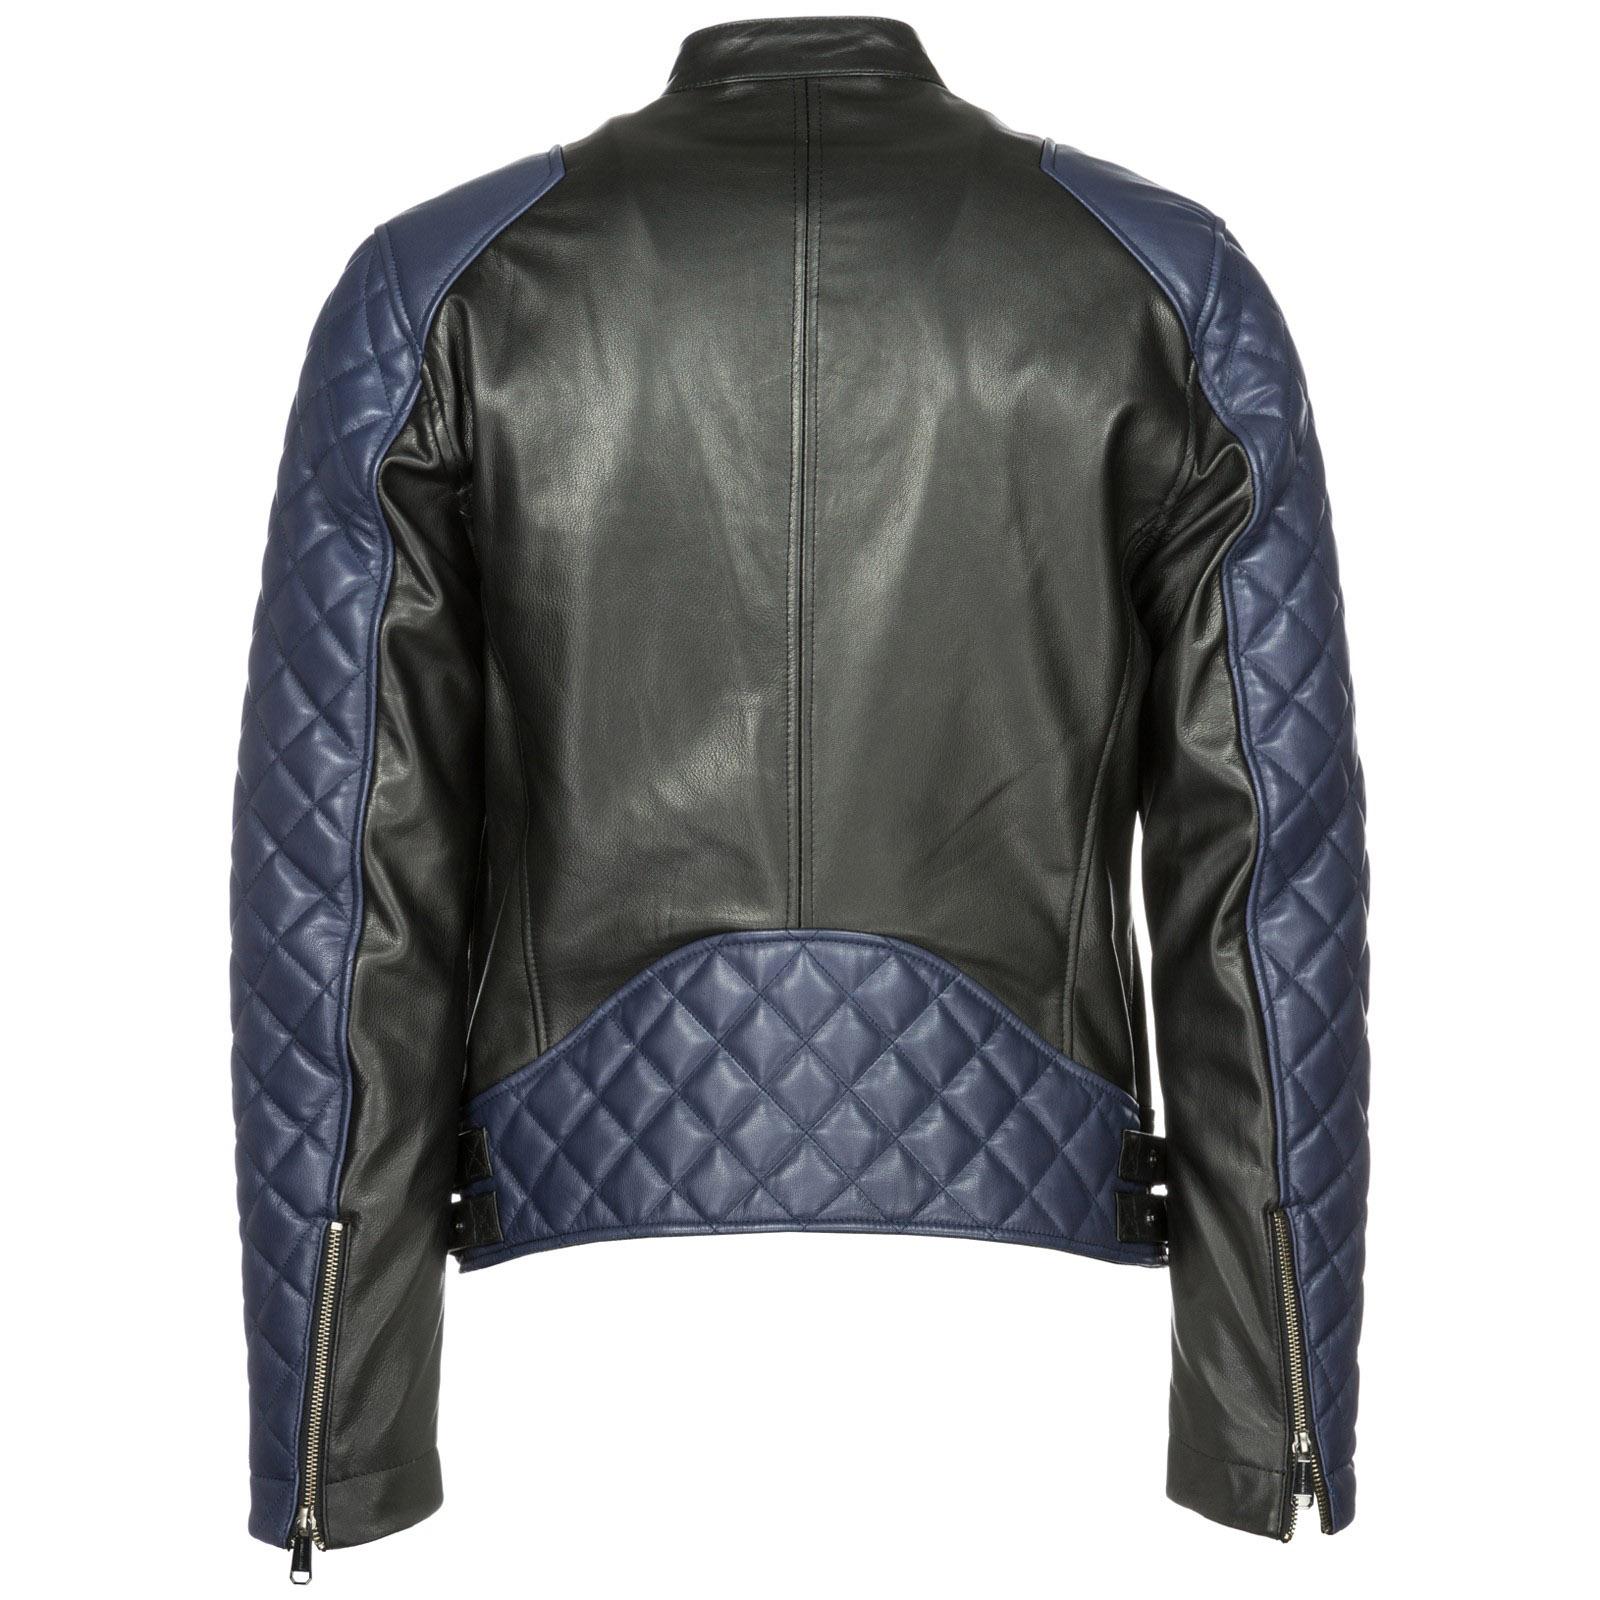 Veste en cuir Versace Jeans ECGSB9P3 nero   FRMODA.com ce1e473d89d